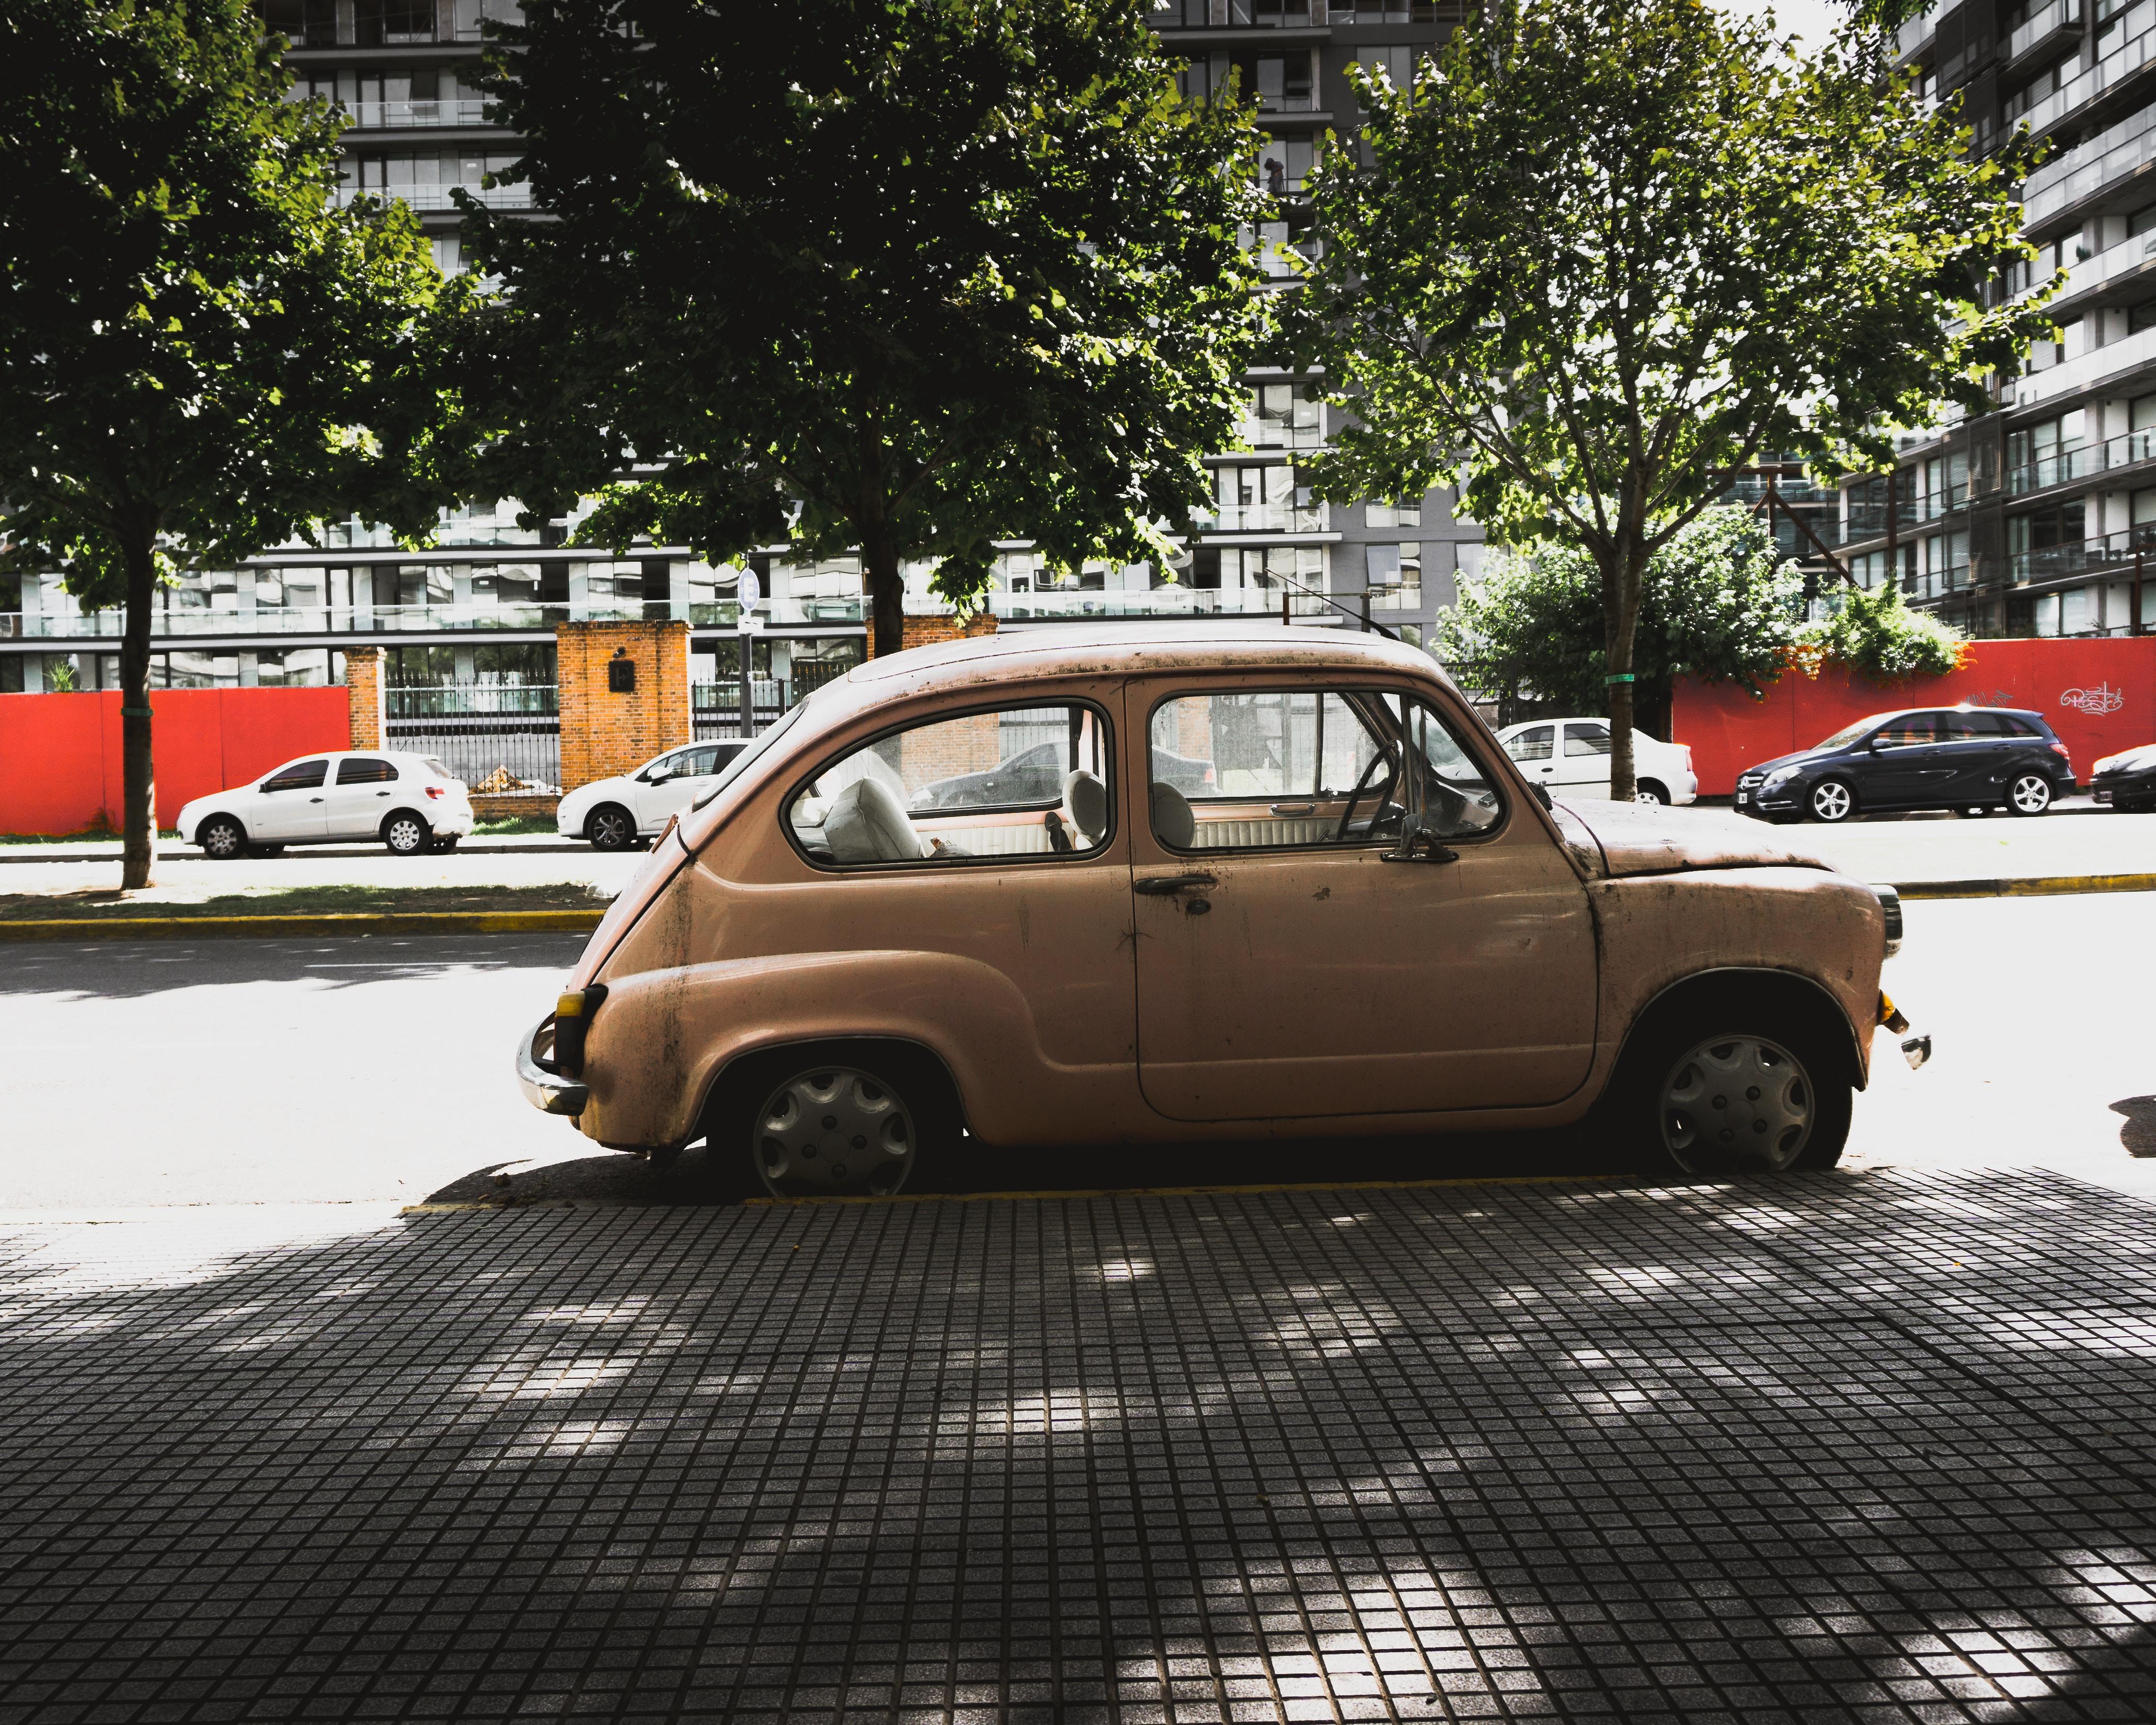 brown 3-door hatchback parked near road gutter